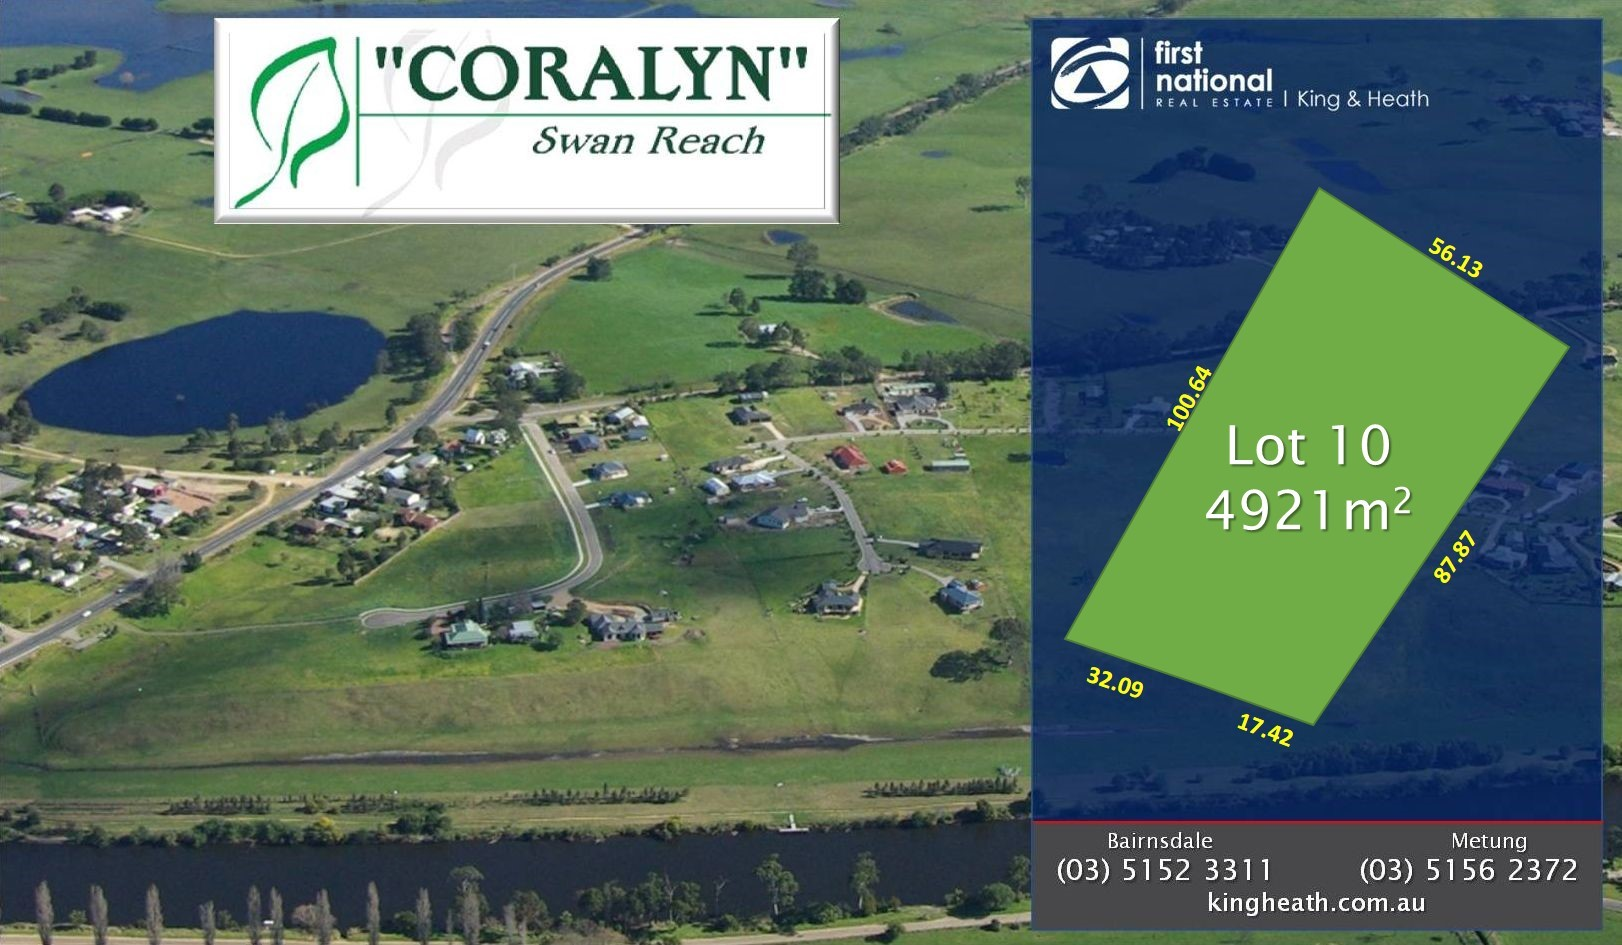 Lot 10 Coralyn Drive, Swan Reach VIC 3903-1